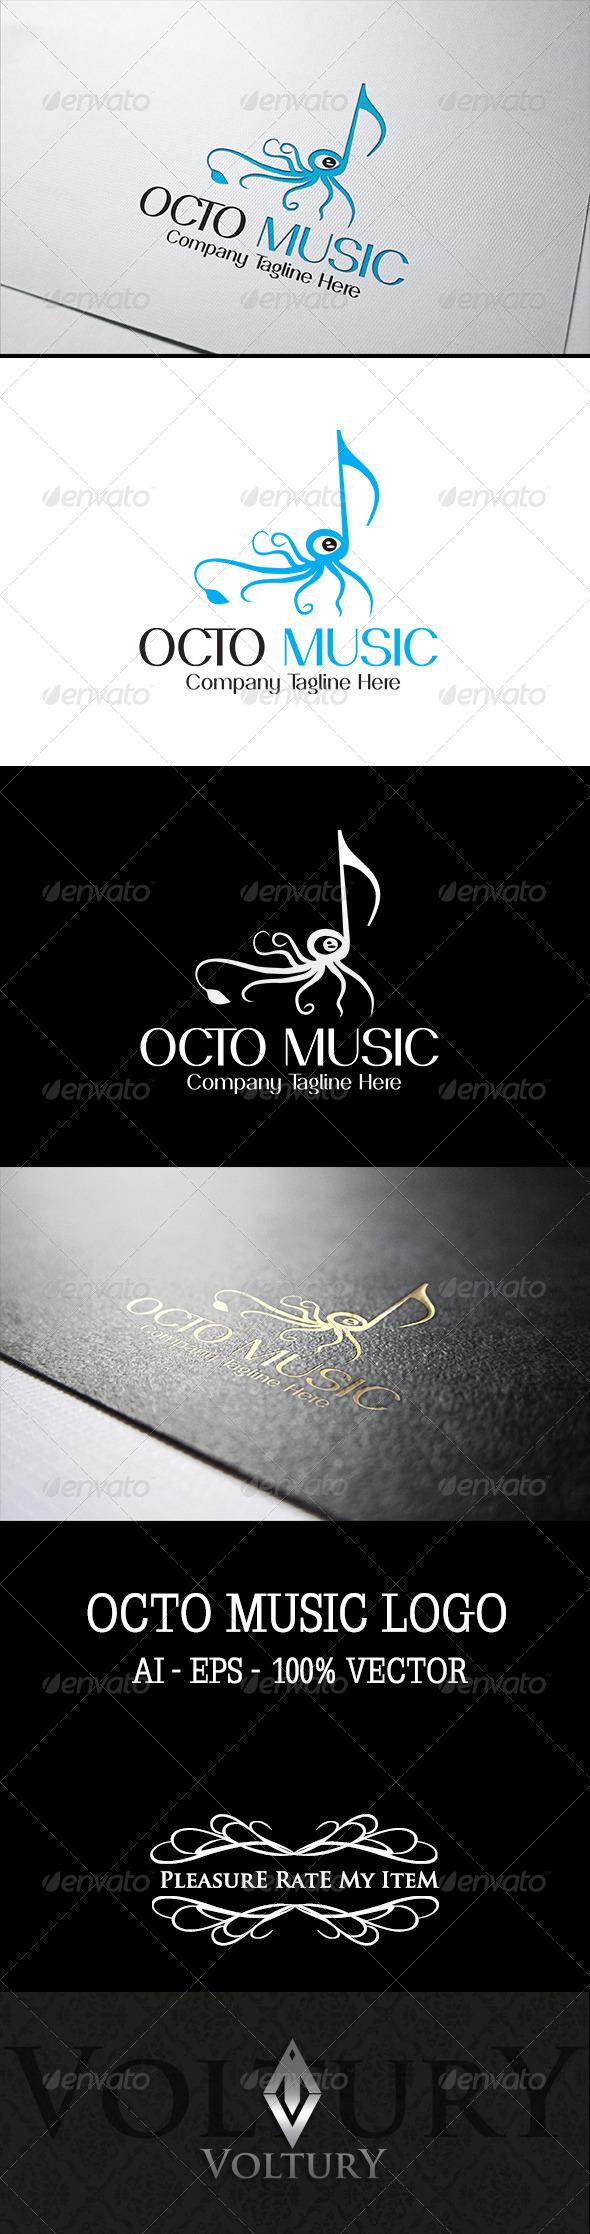 GraphicRiver Octo Music Logo 7522309